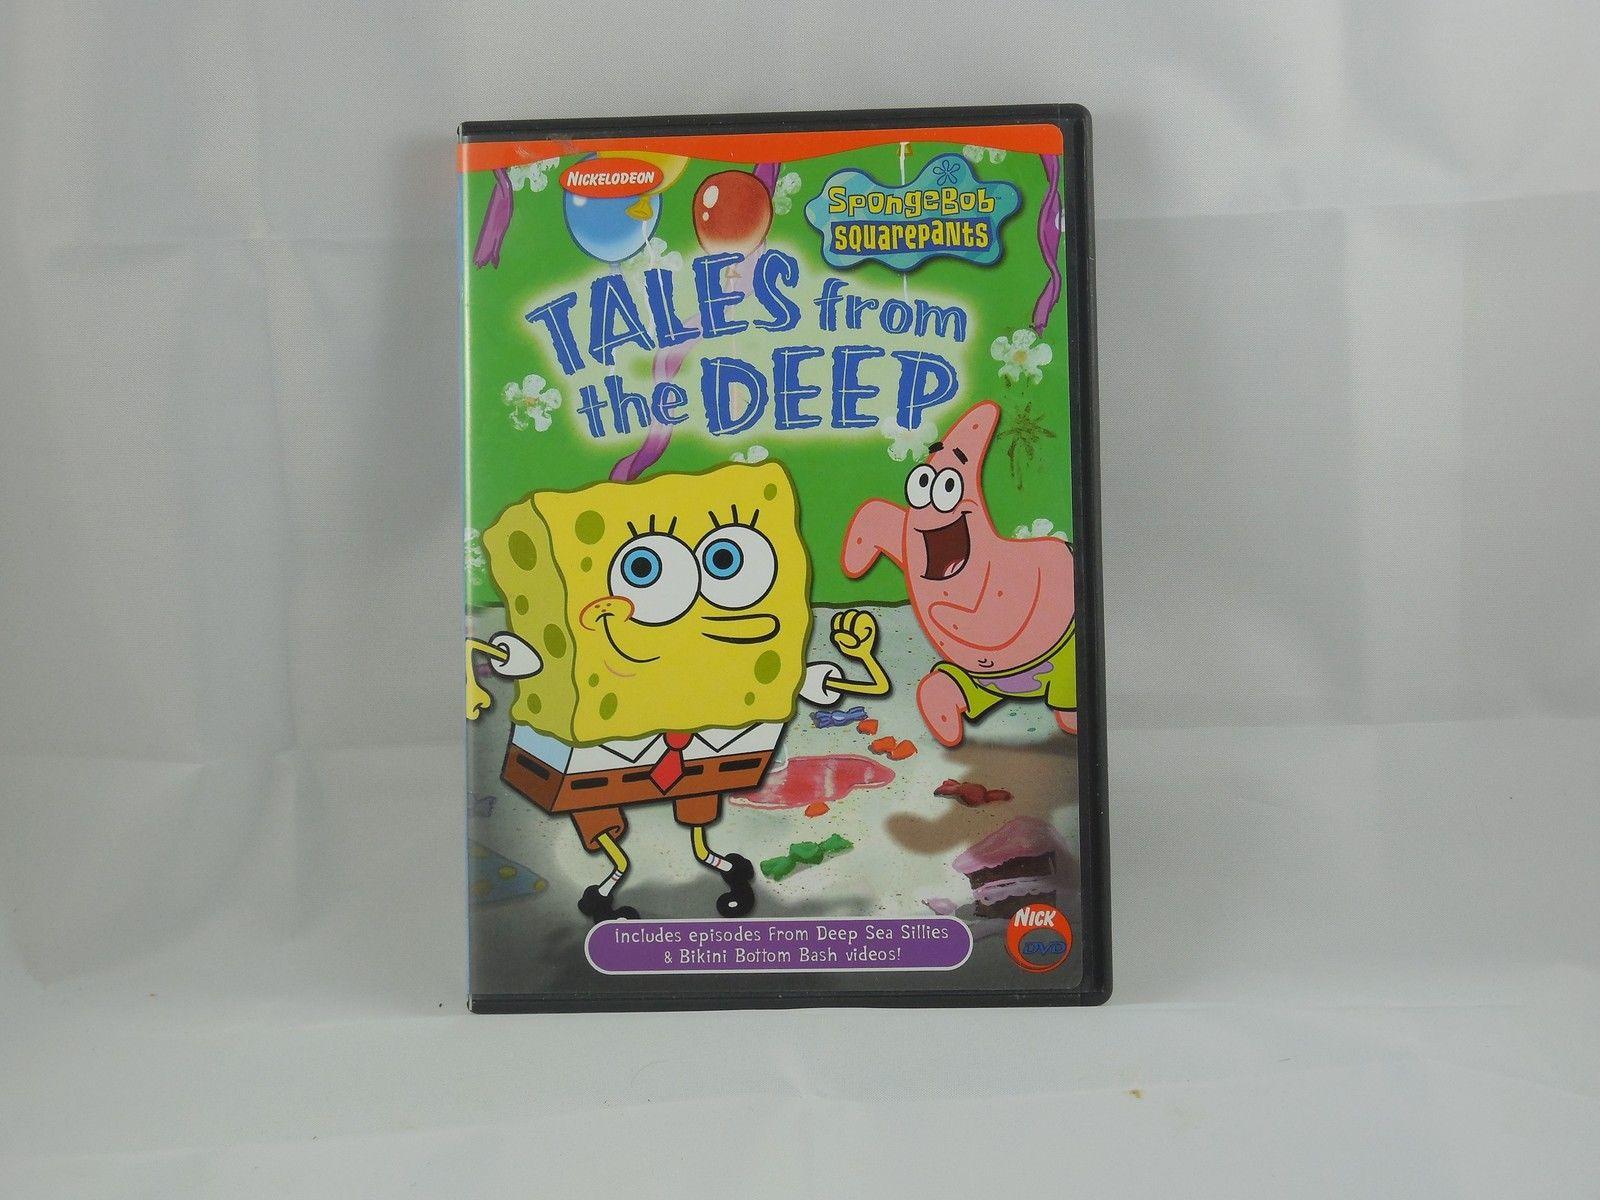 Spongebob Squarepants - Tales from the Deep (DVD, 2002)